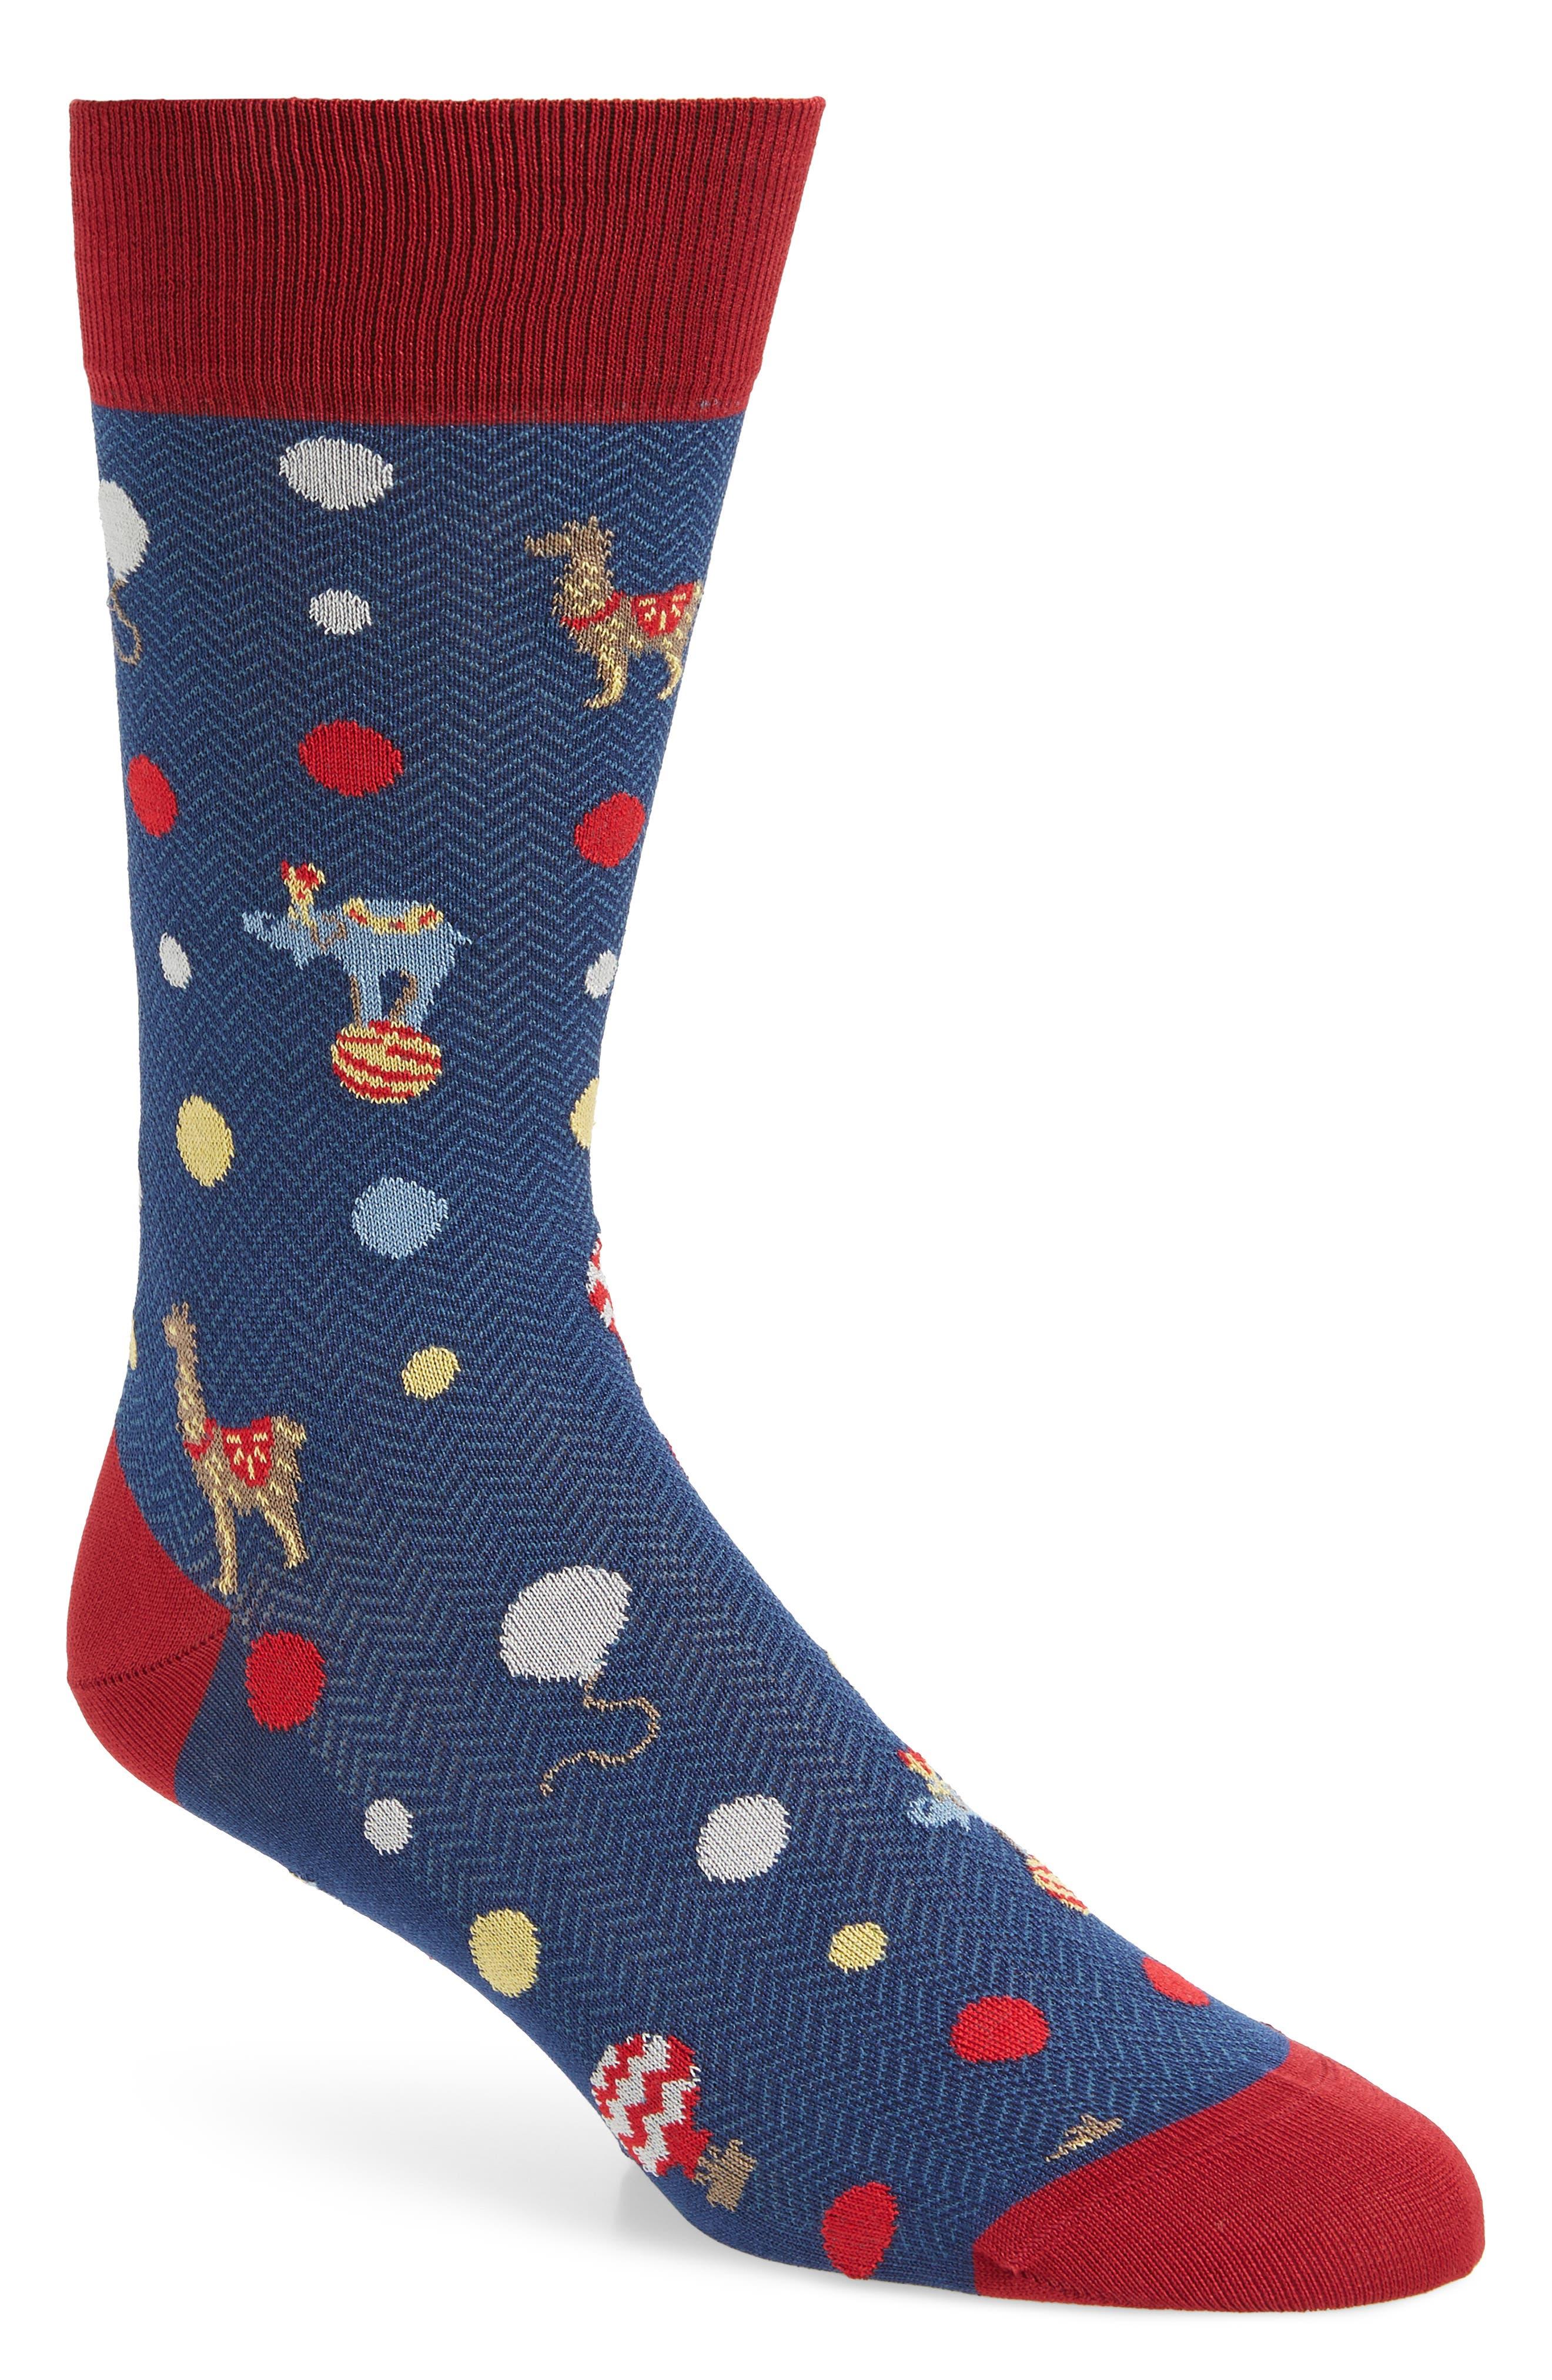 BUGATCHI Jacquard Mercerized Socks, Main, color, NAVY